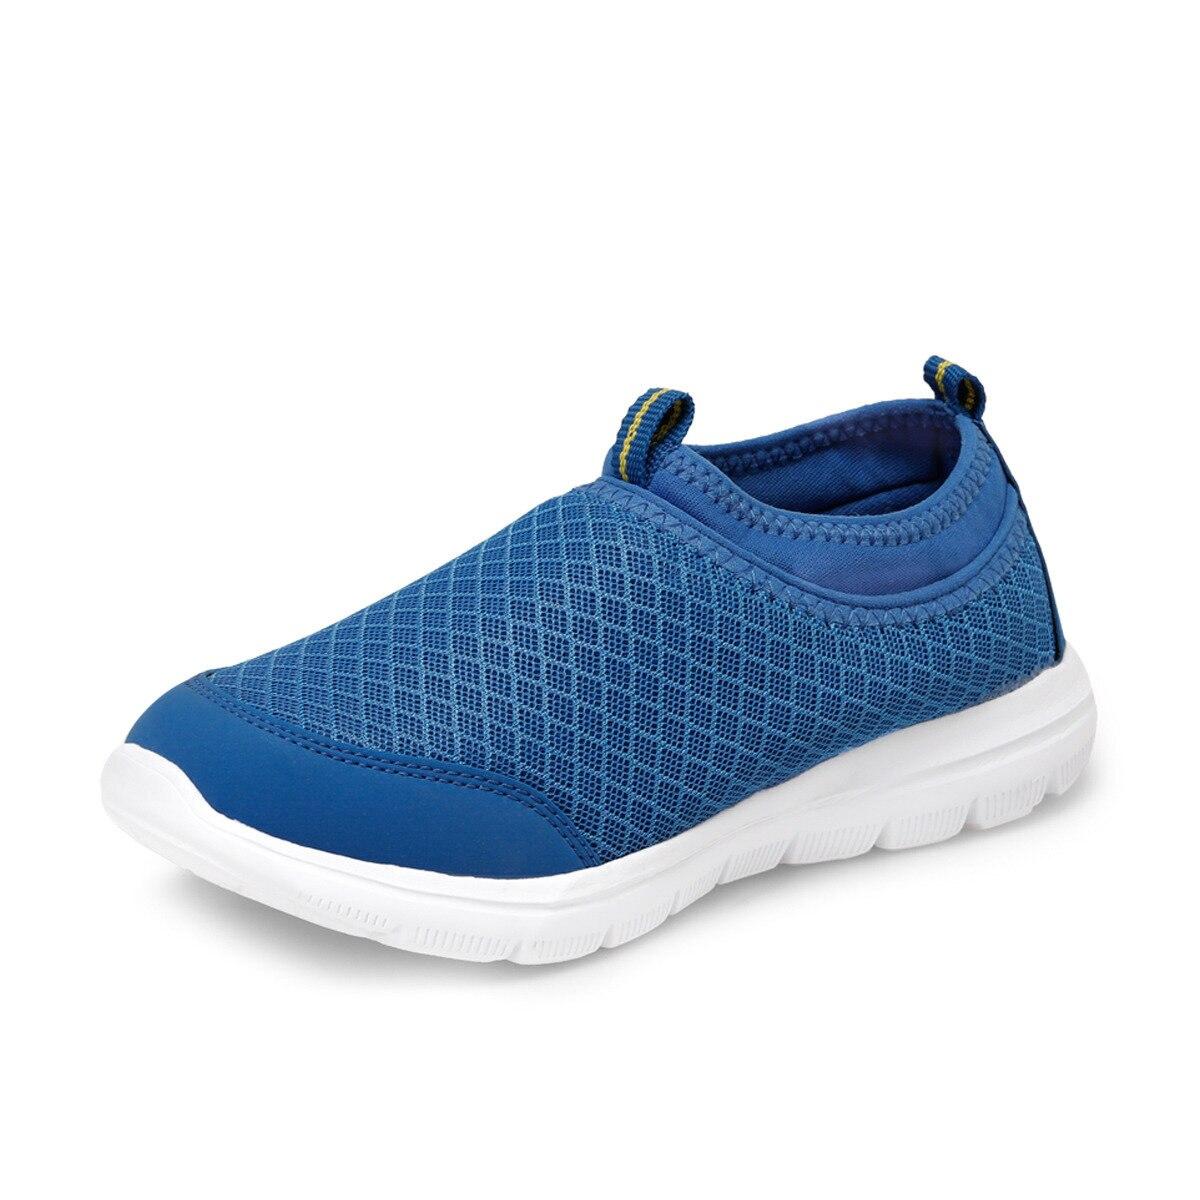 FLO VOTEN J Saks Male Child Slip On Shoes KINETIX